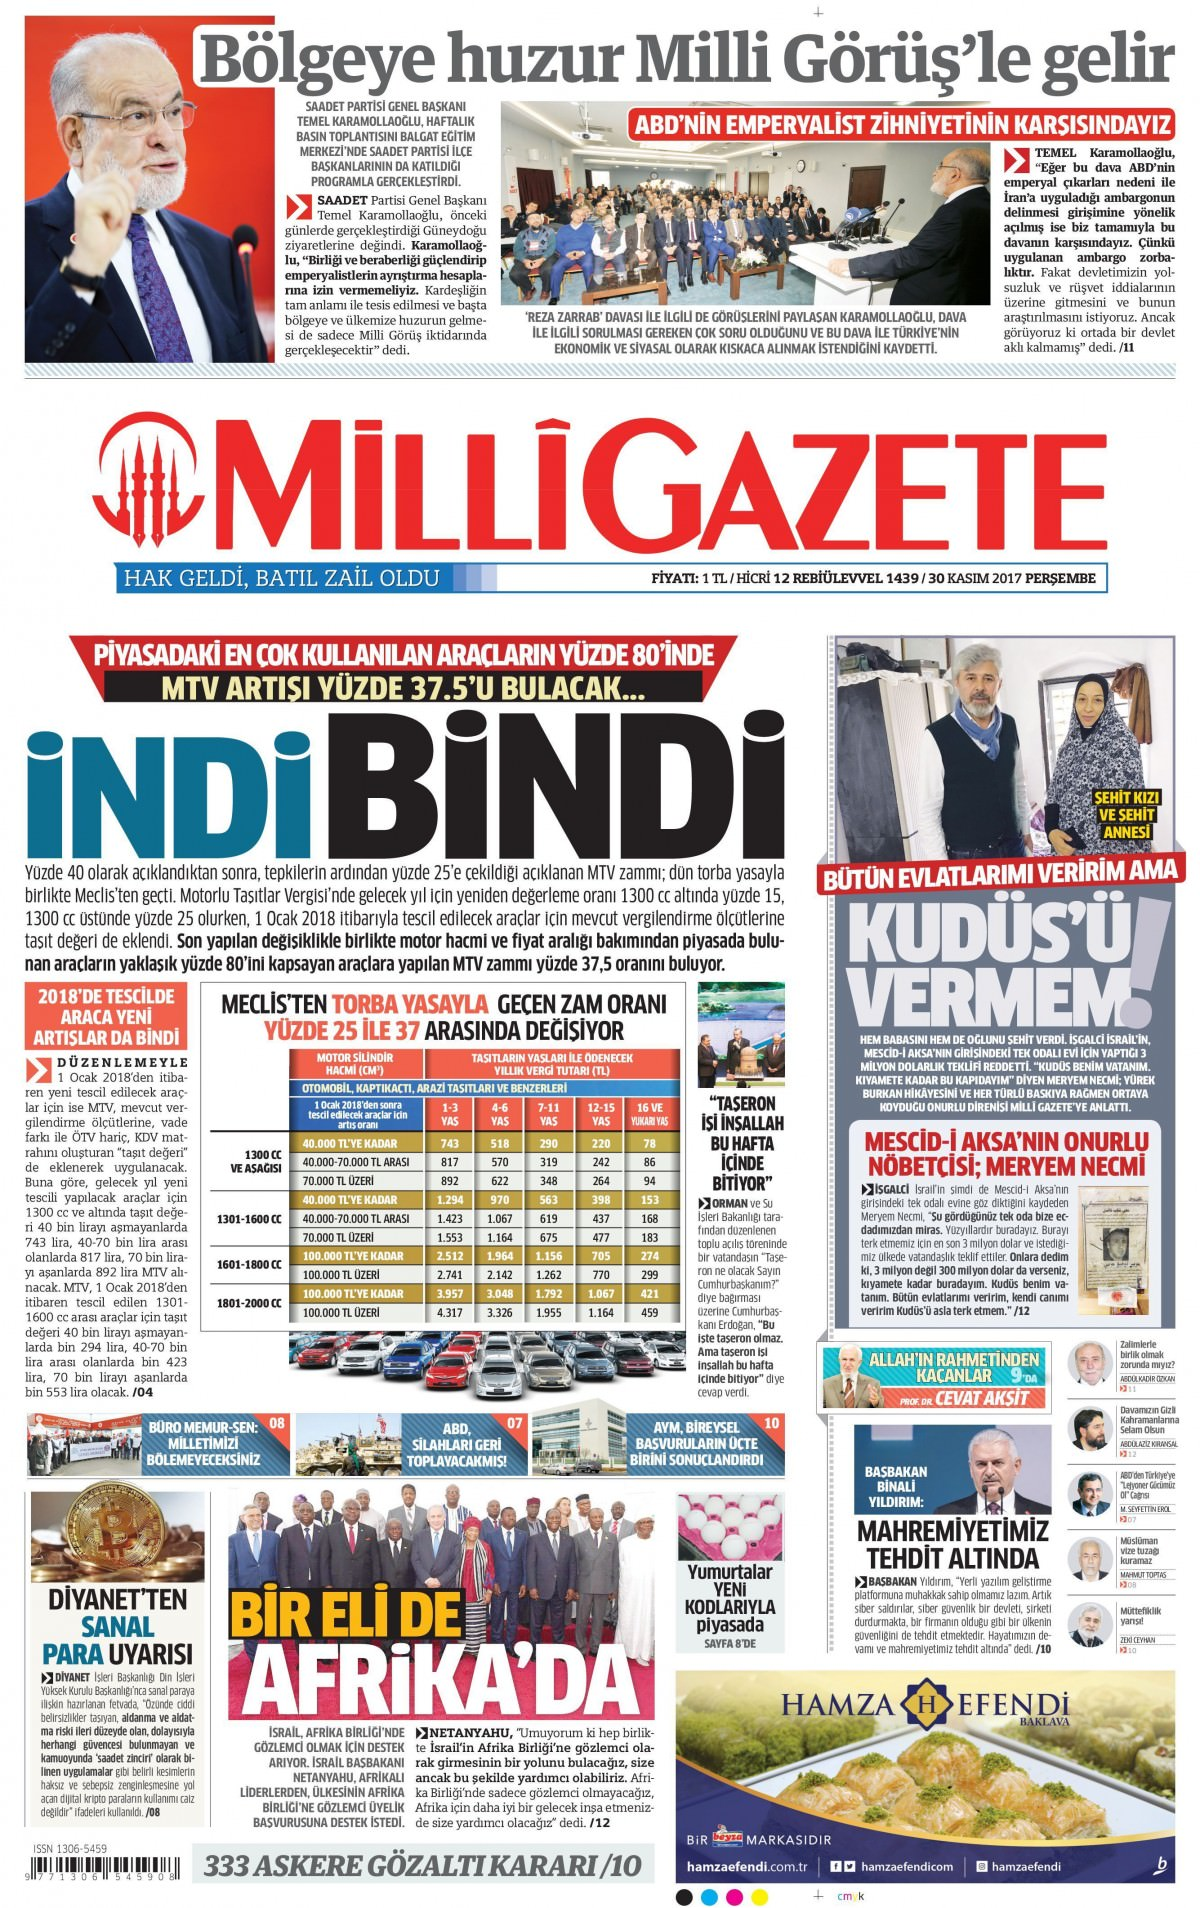 Gazeteler bugün hangi manşeti attı 10